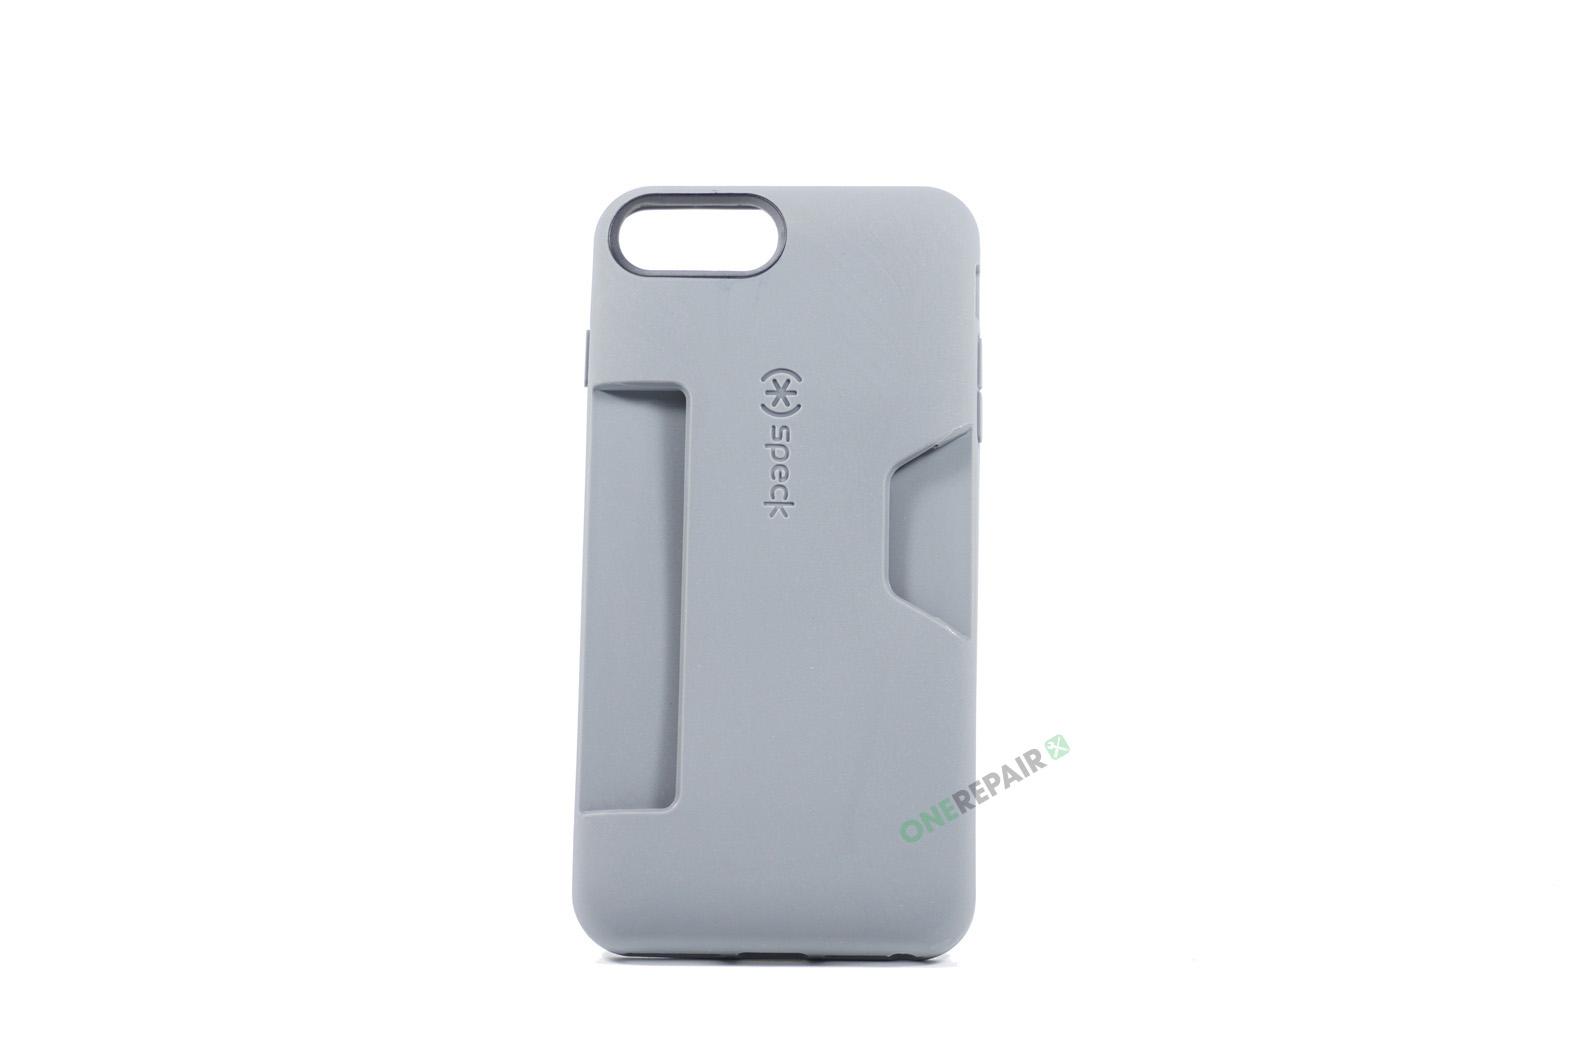 350863_iPhone_7+_8+_Plus_Speak_Gummicover_Korholder_Graa_Cover_OneRepair_WM_00001